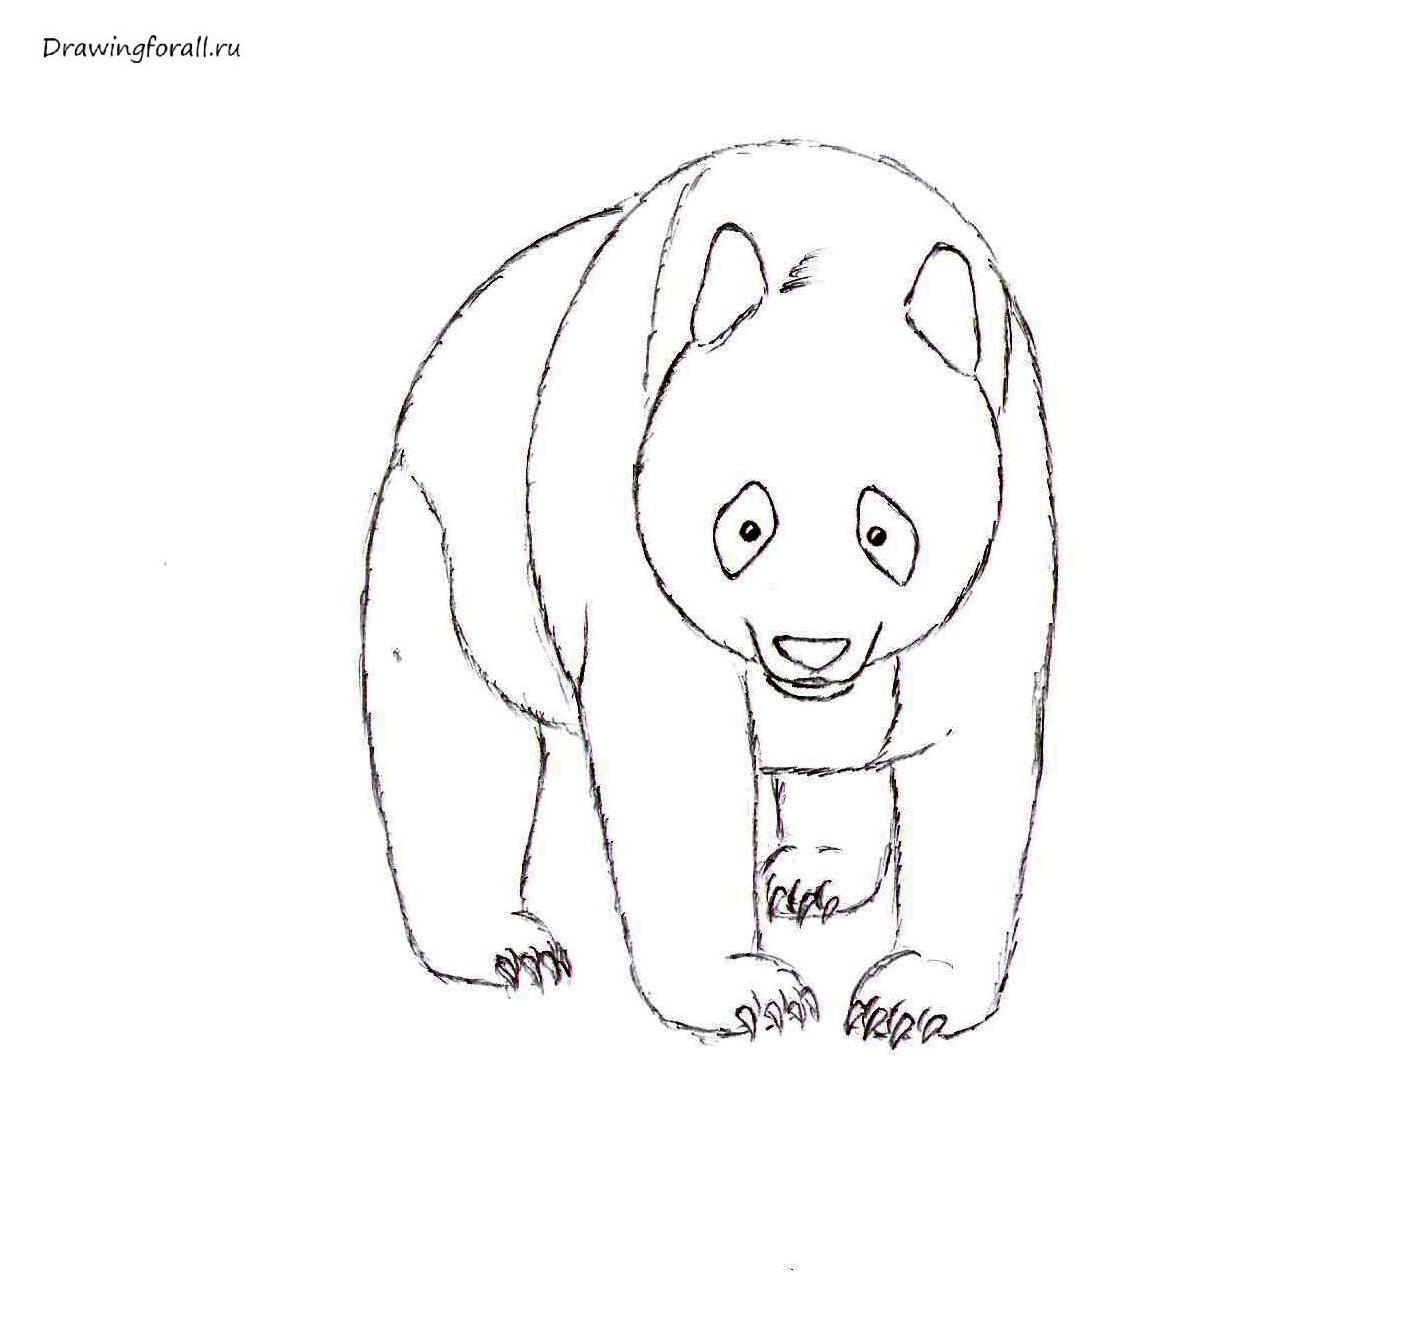 рисунок панды поэтапно гомер, привыкший